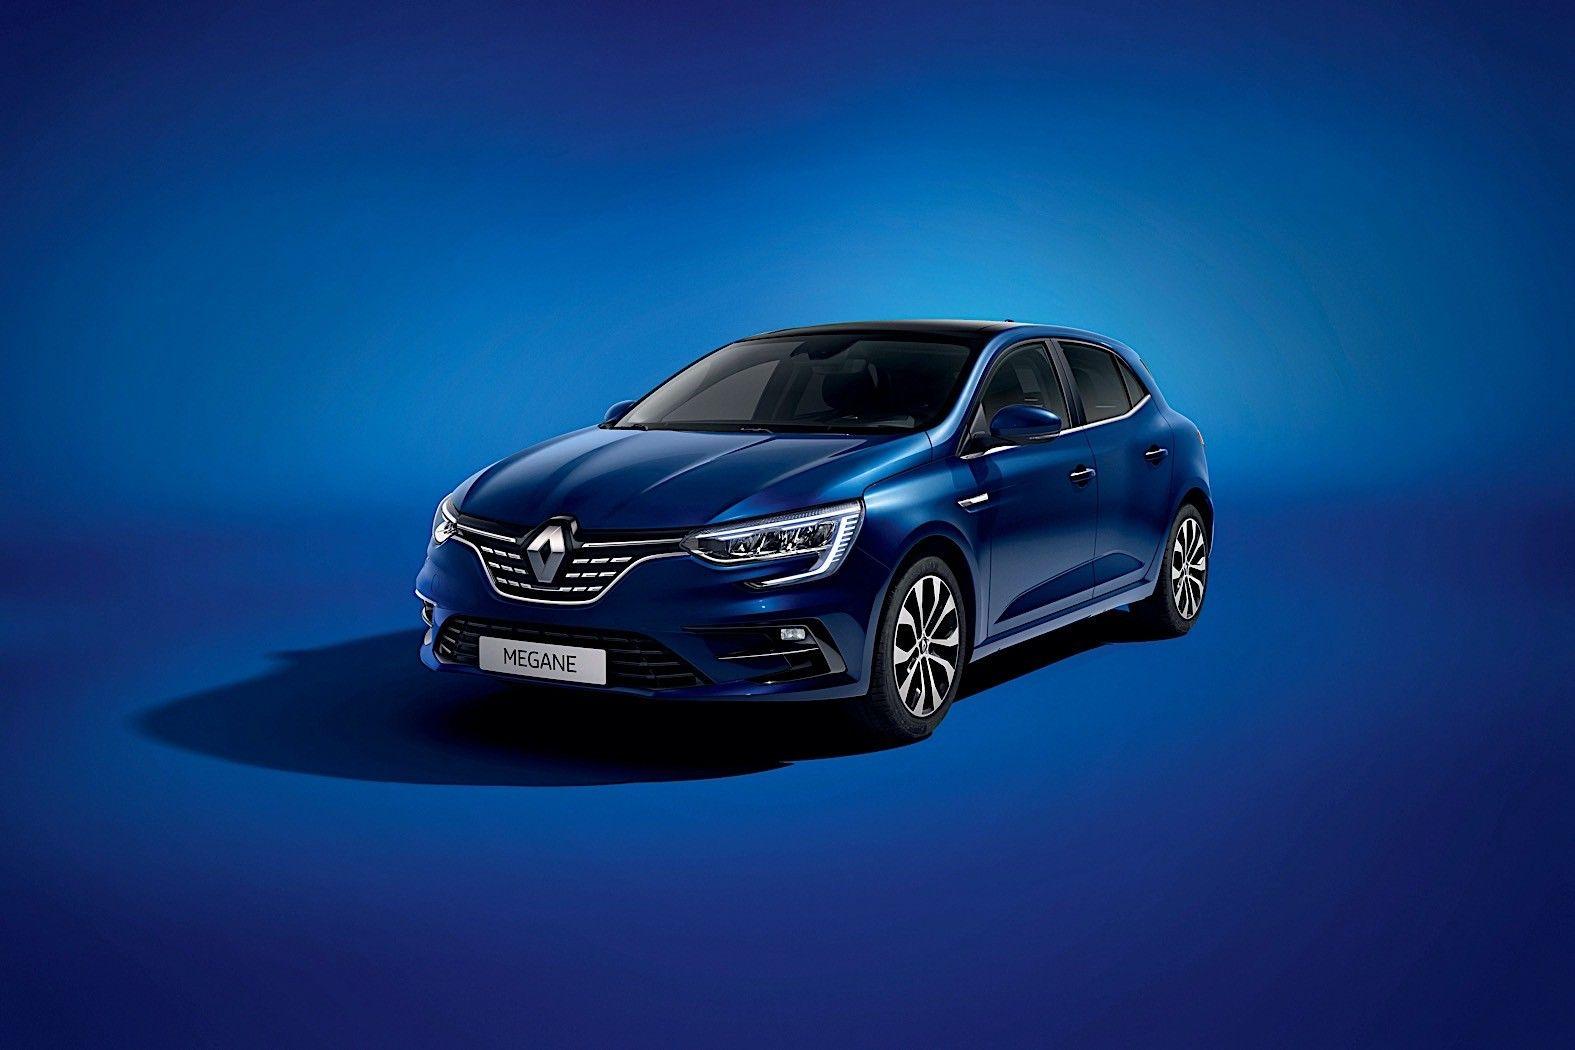 2021 Renault Megane Suv Release Renault Megane Renault New Renault